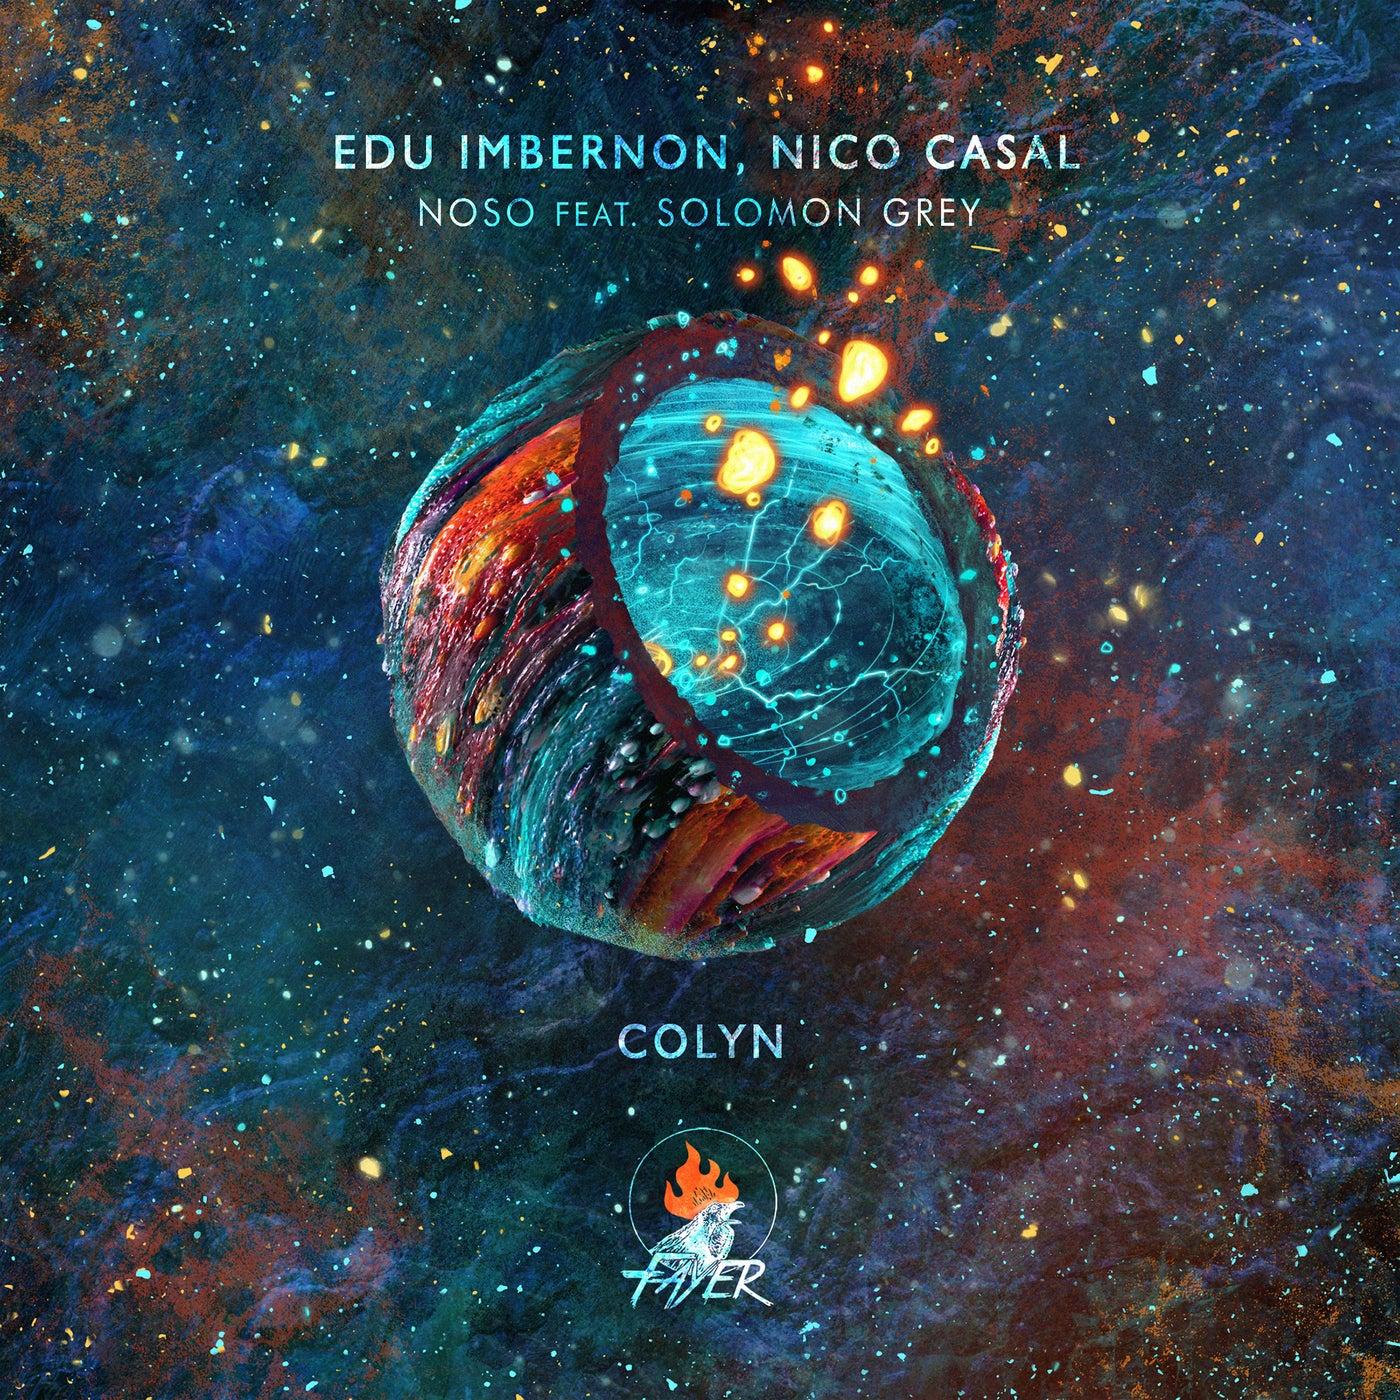 Noso feat. Solomon Grey (Colyn Remix)